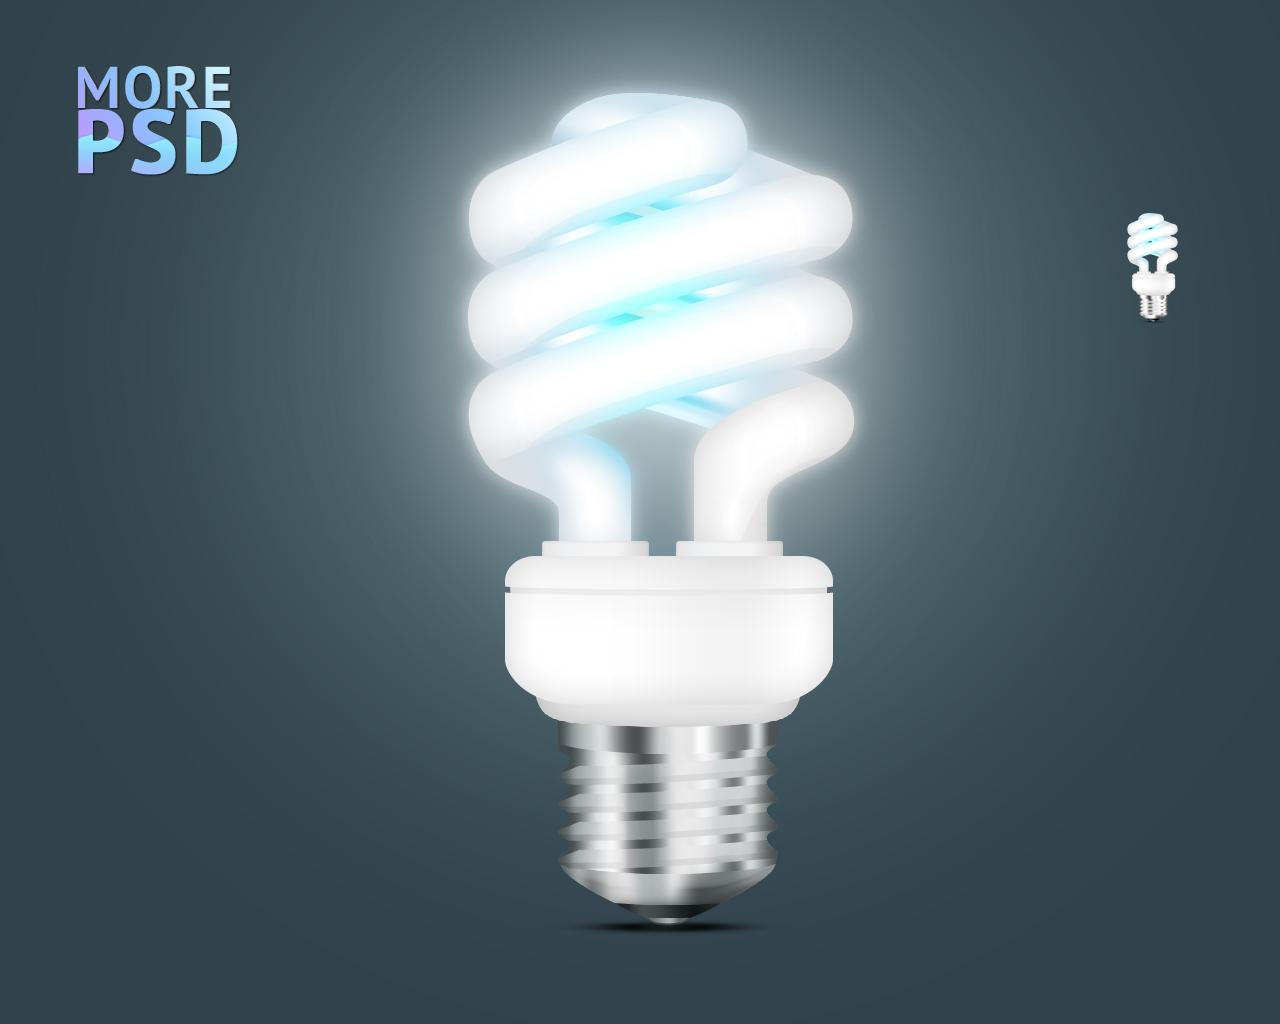 иконка, png, psd, энергосберегающая лампа, energy save lamp, icon